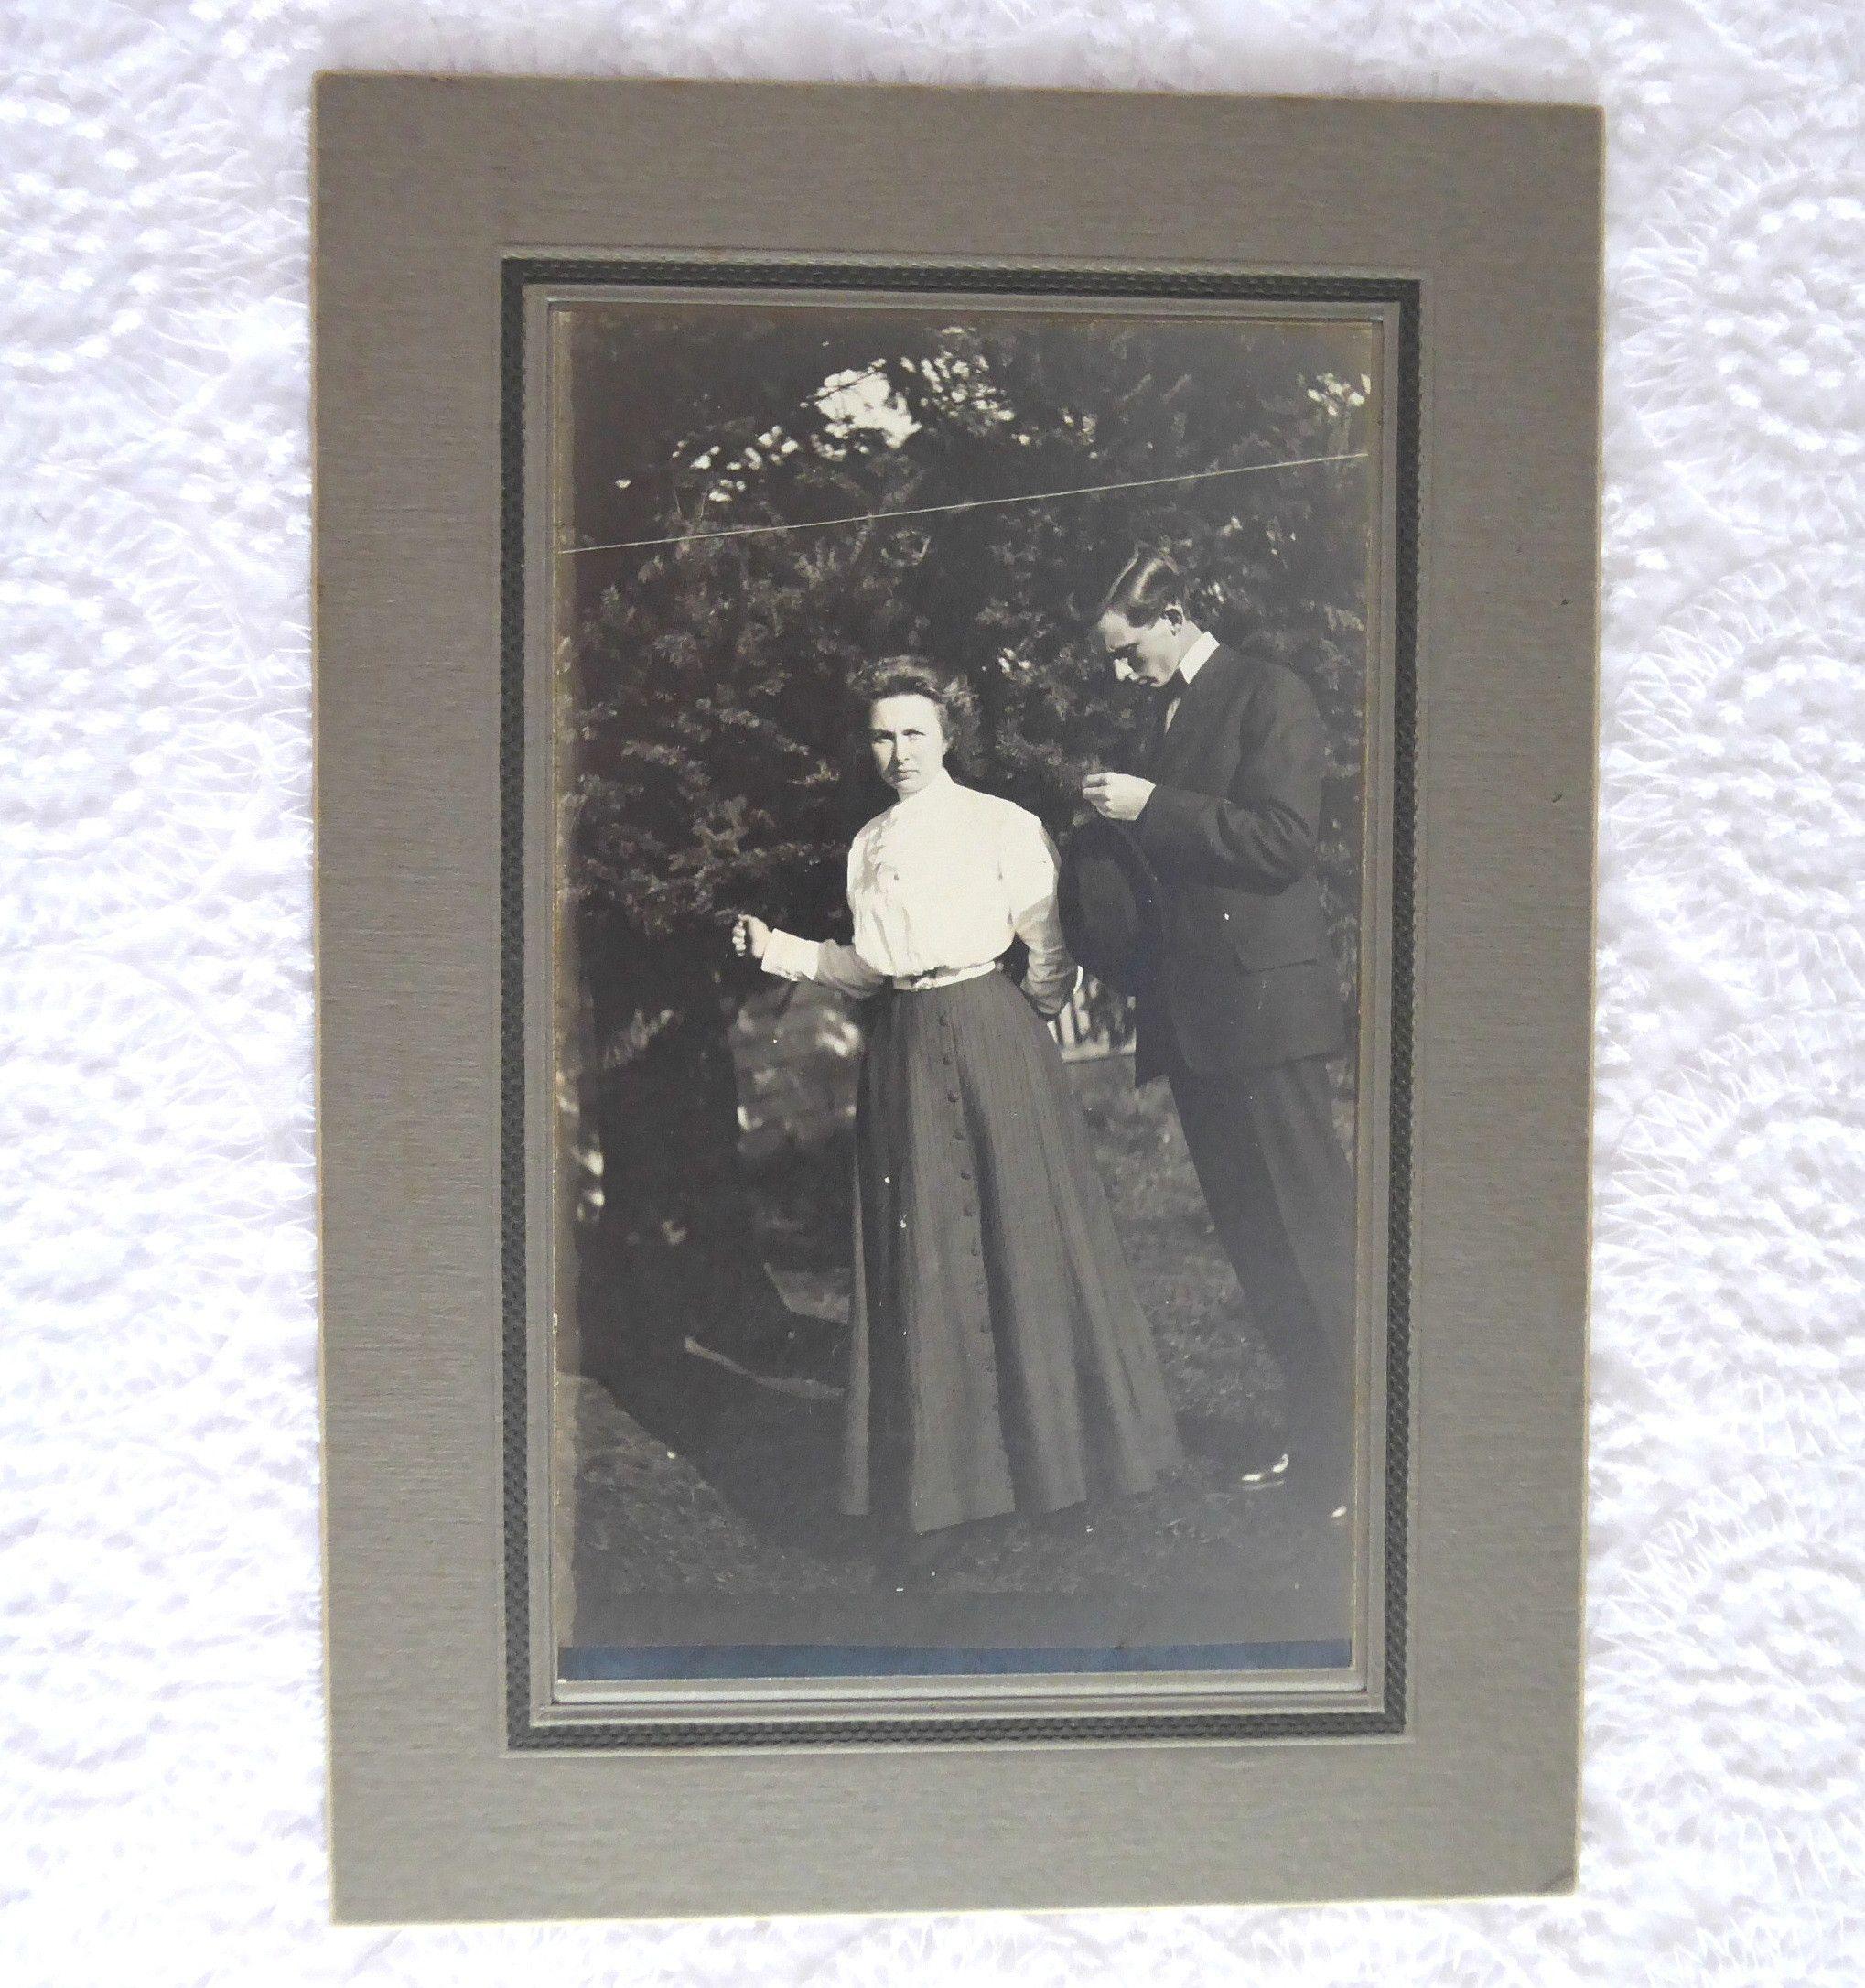 Cabinet Card Photo Edwardian Couple Shirtwaist Looking Shy 1890-1910 Early Photo